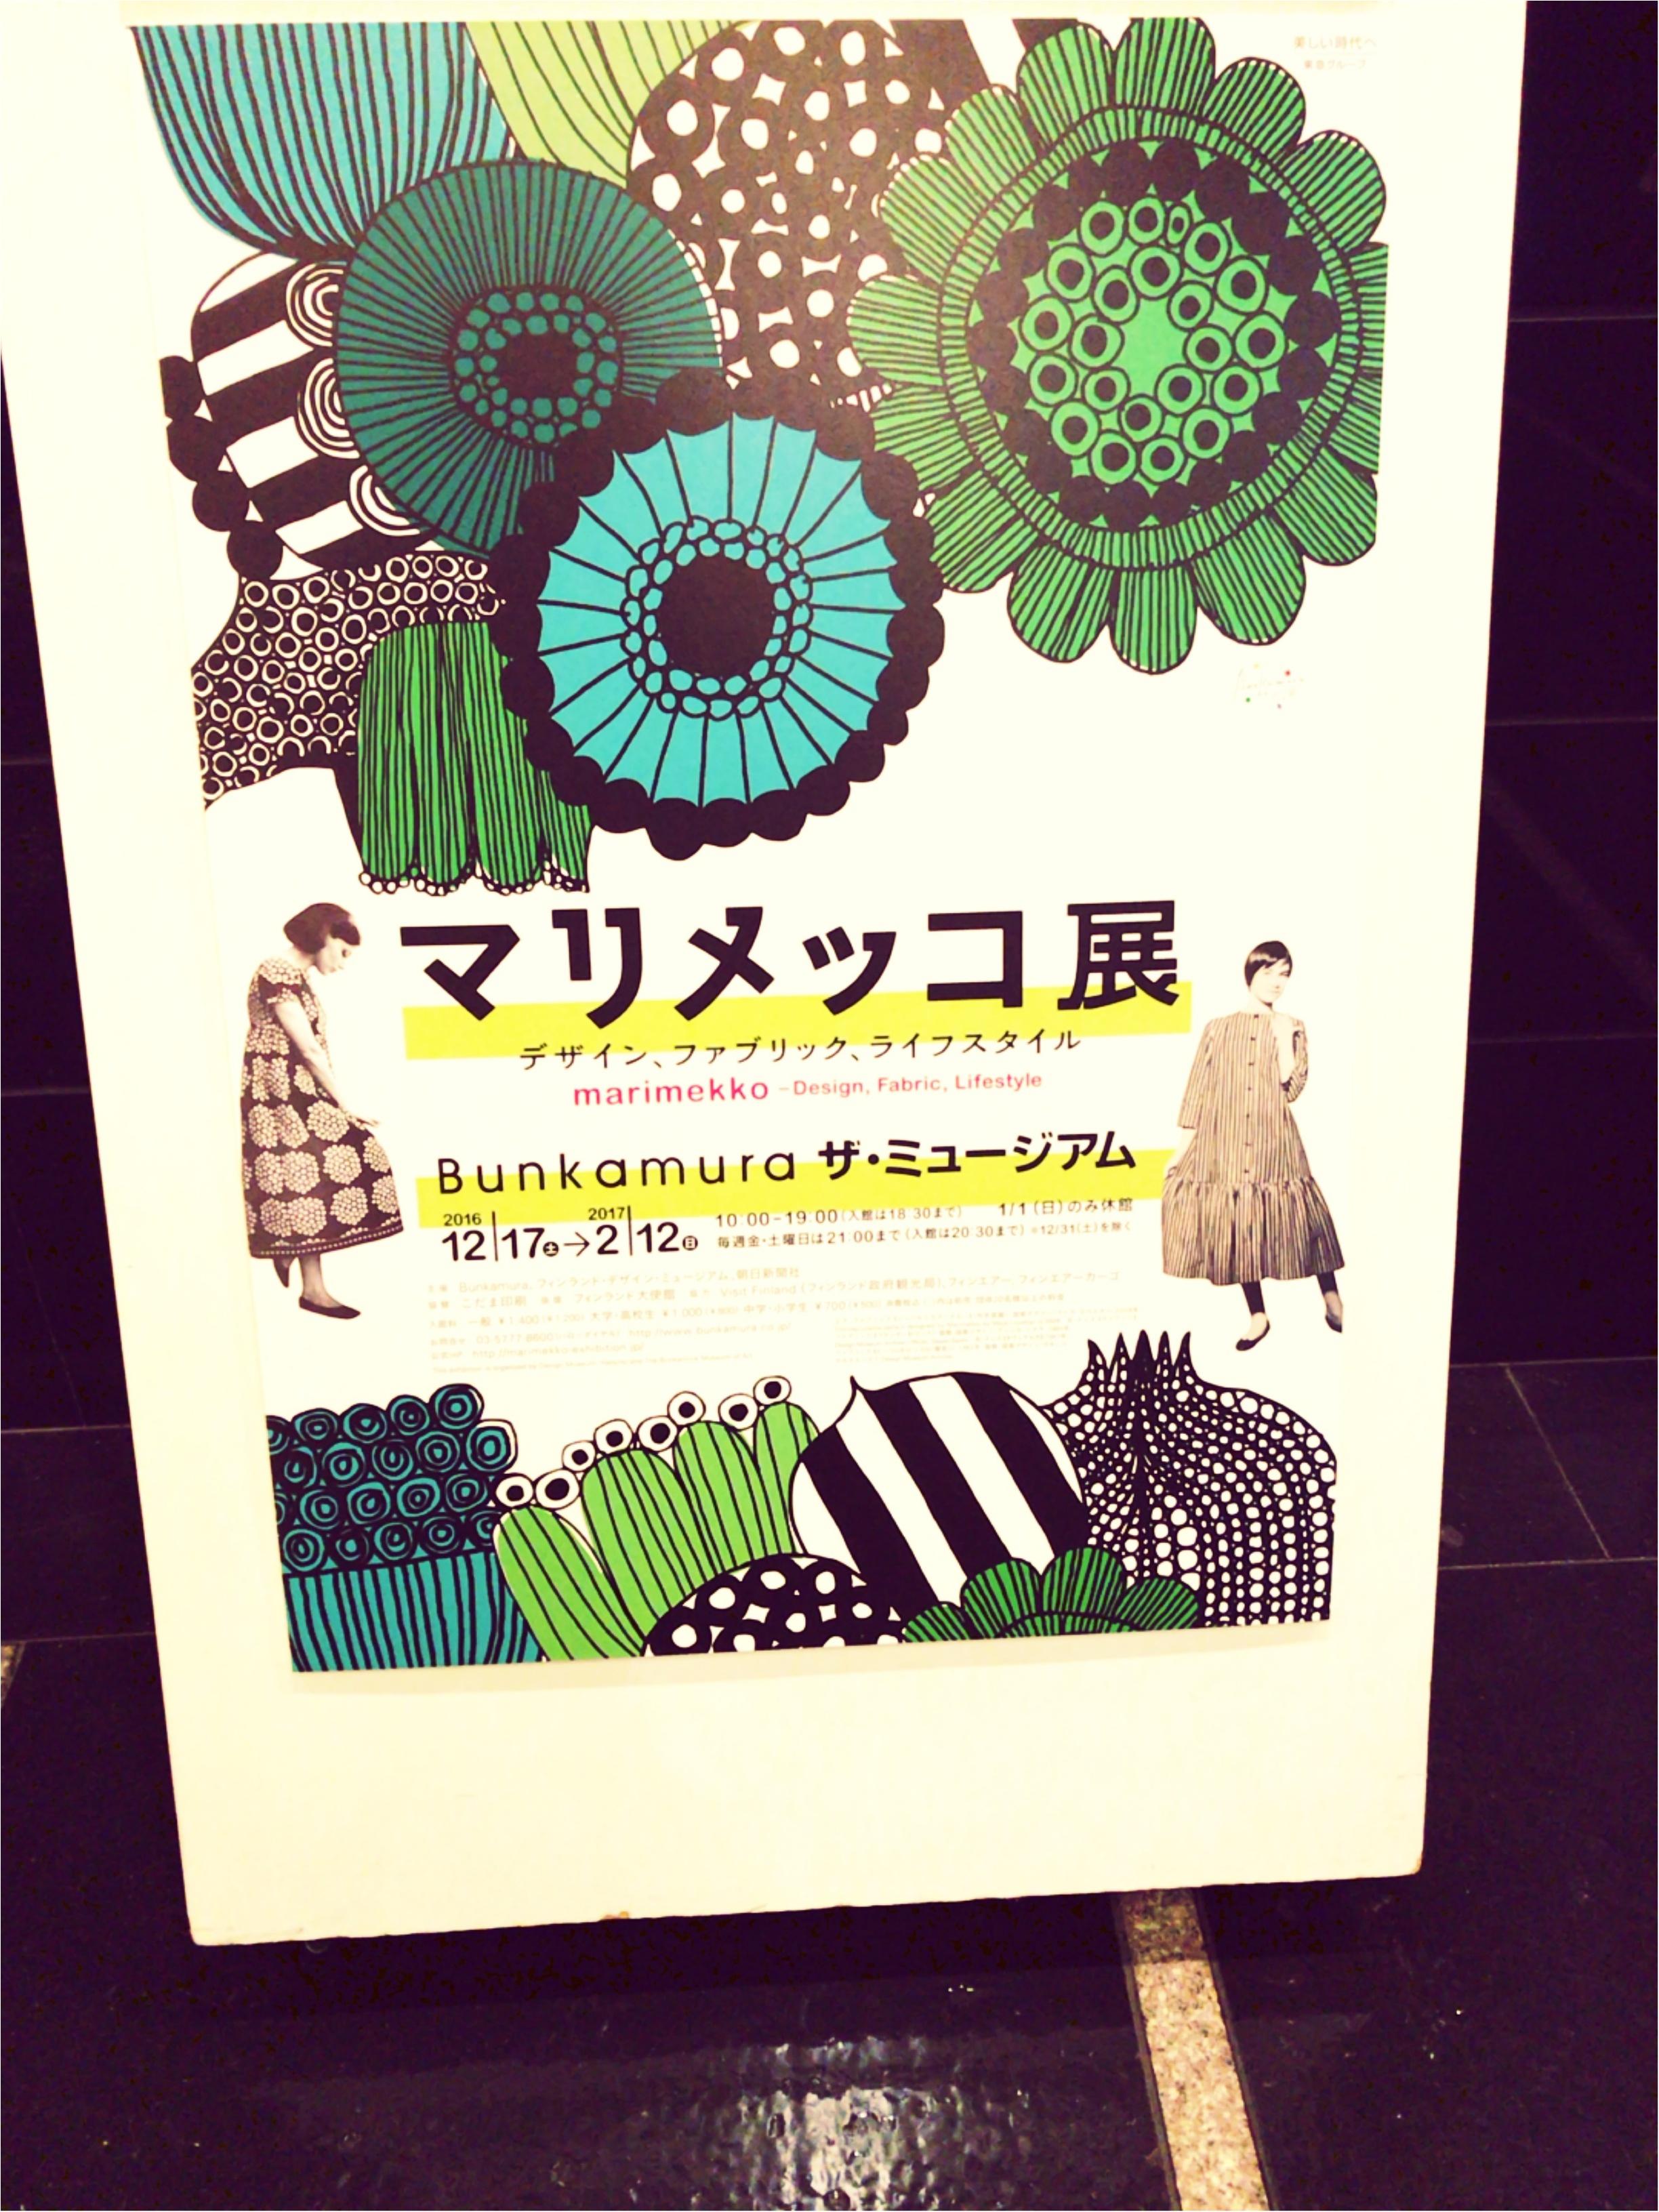 marimekko~渋谷で開催中のマリメッコ展へ行ってきました♡_1